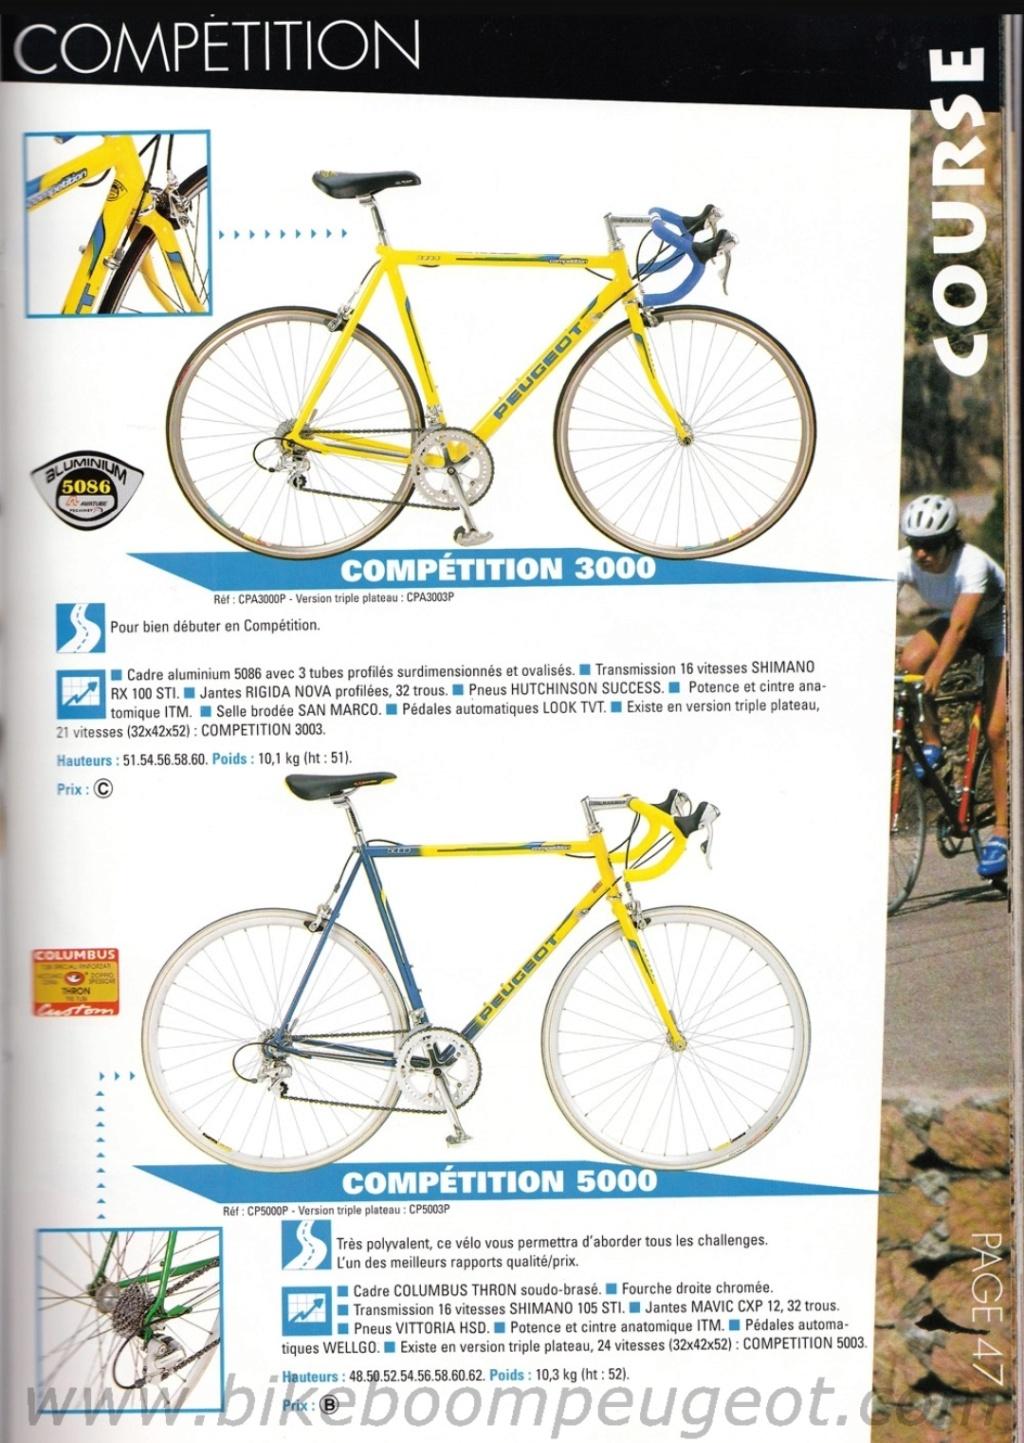 Peugeot 7000 finalement...  Img_2101